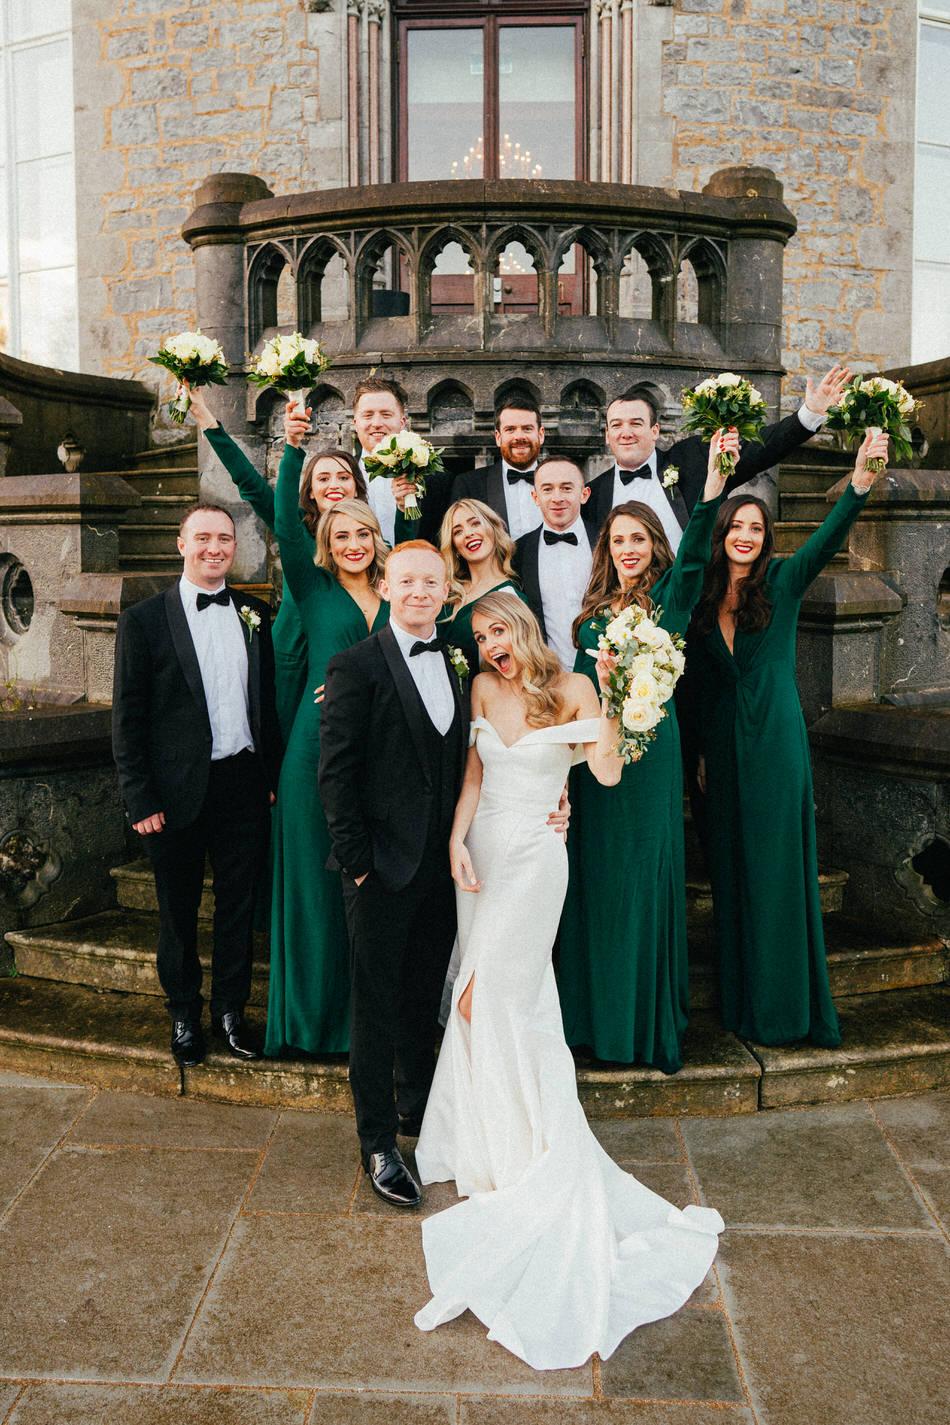 Castle-wedding-ireland-photos- 0217 157